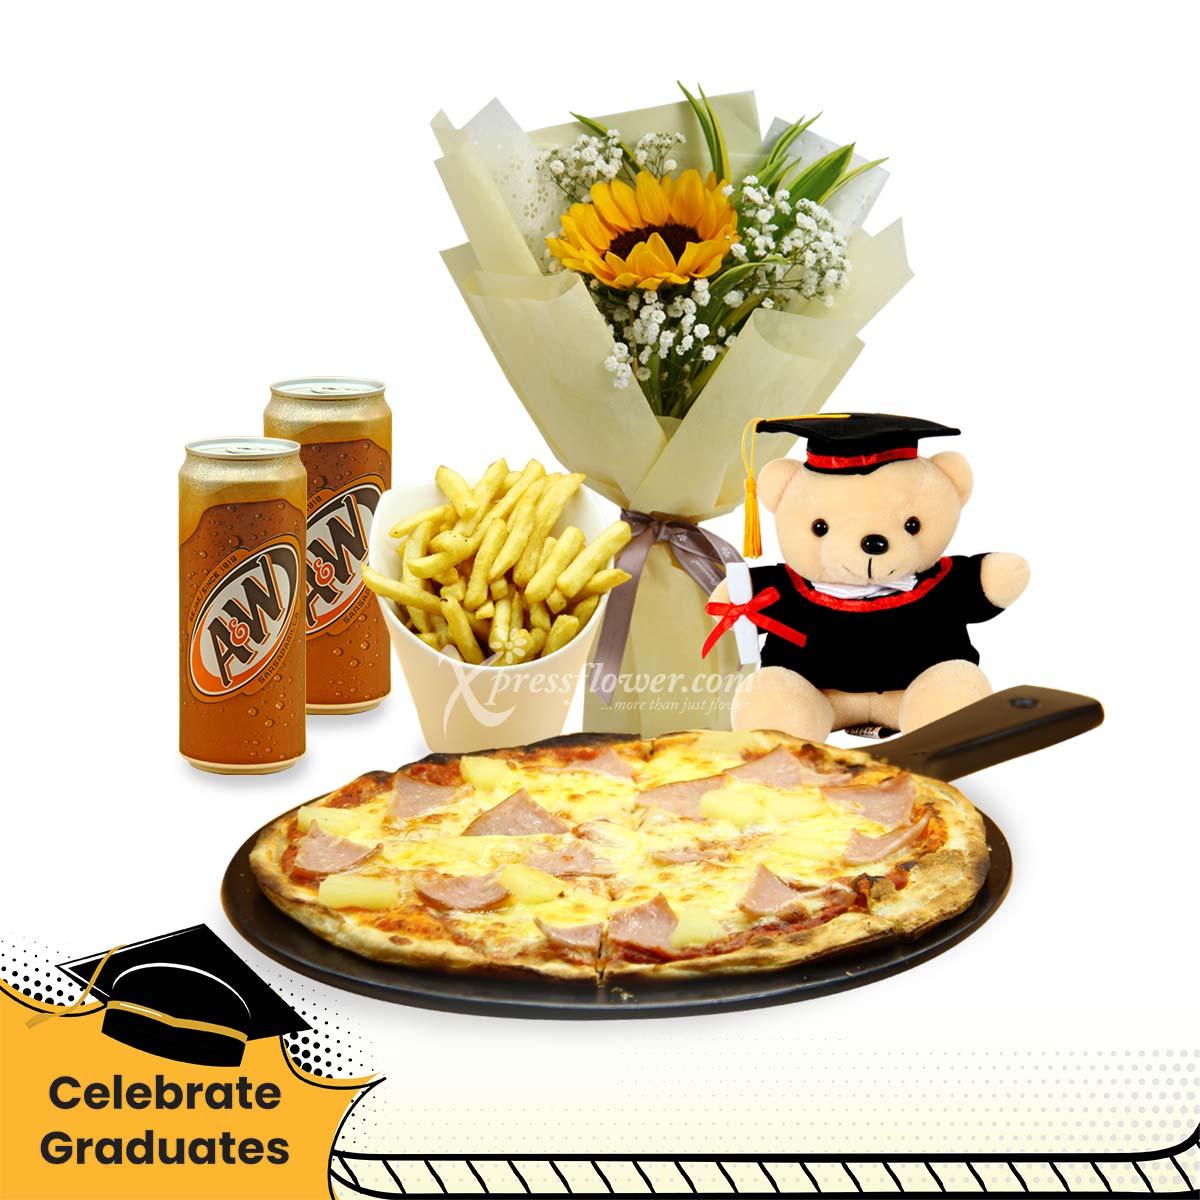 Worthy Celebration (1 sunflower bouquet, 7'' Graduation bear, and Knots pizza combo)